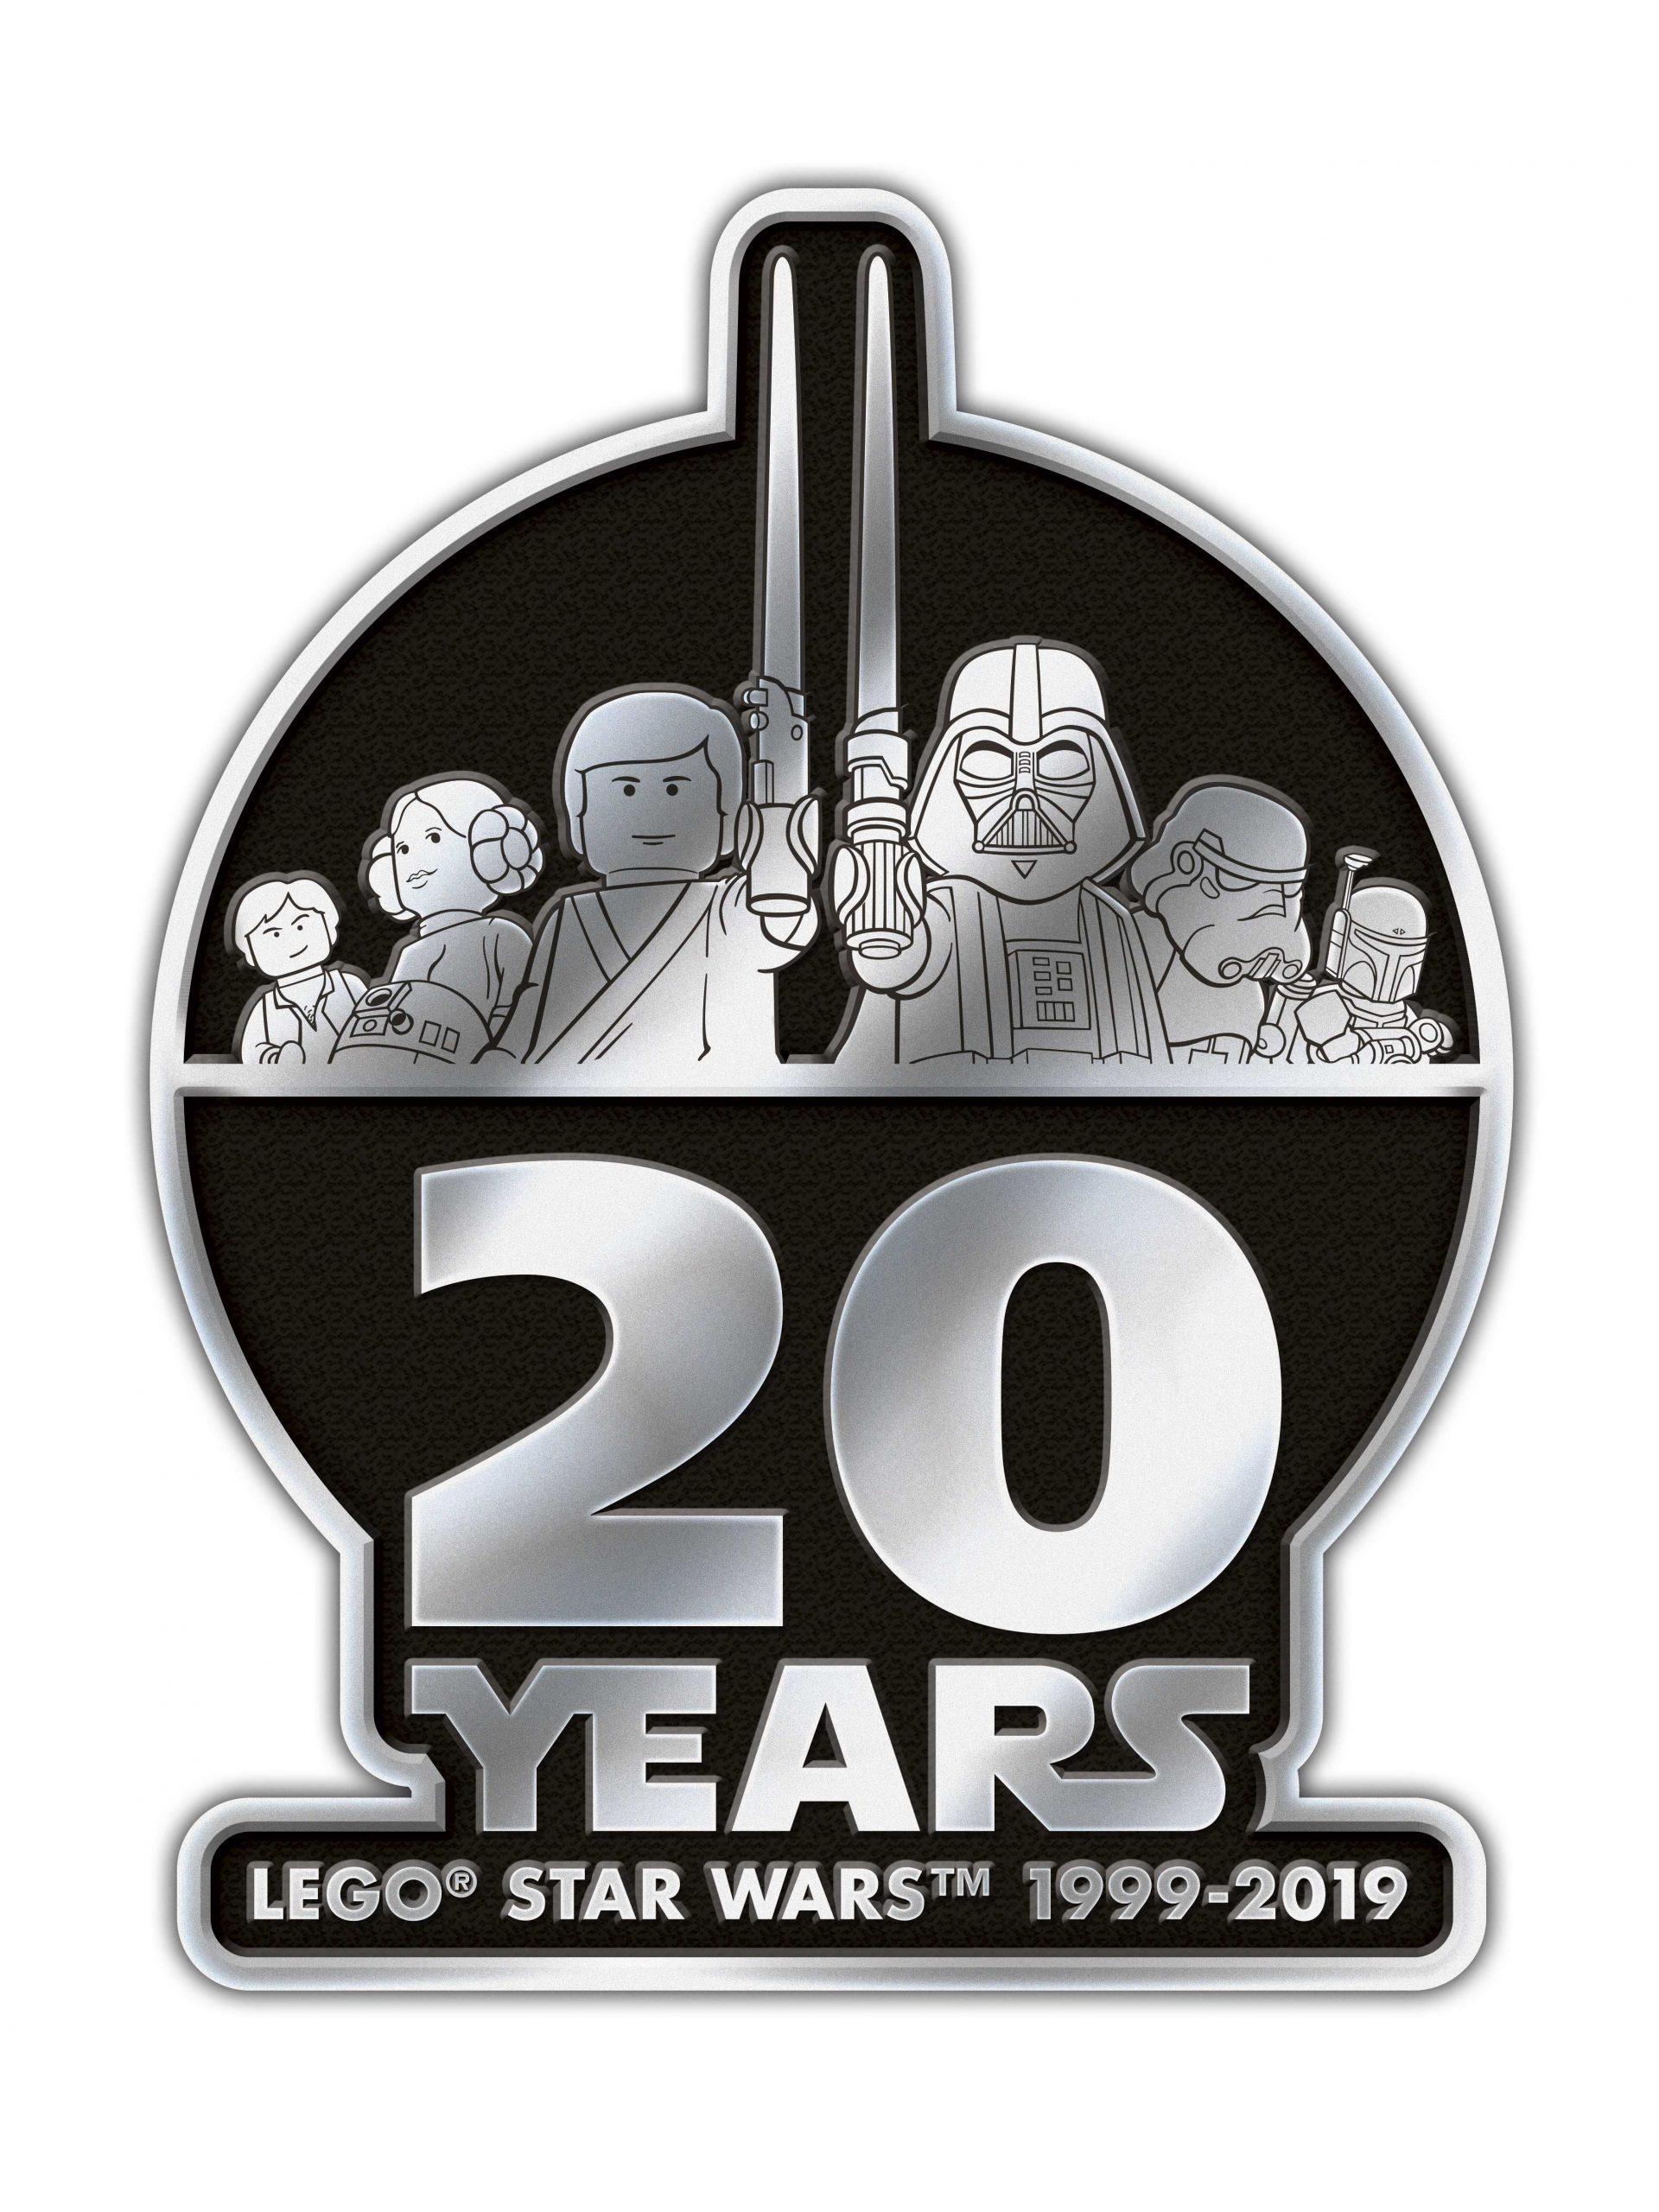 LEGO Star Wars celebra il suo 20esimo anniversario thumbnail